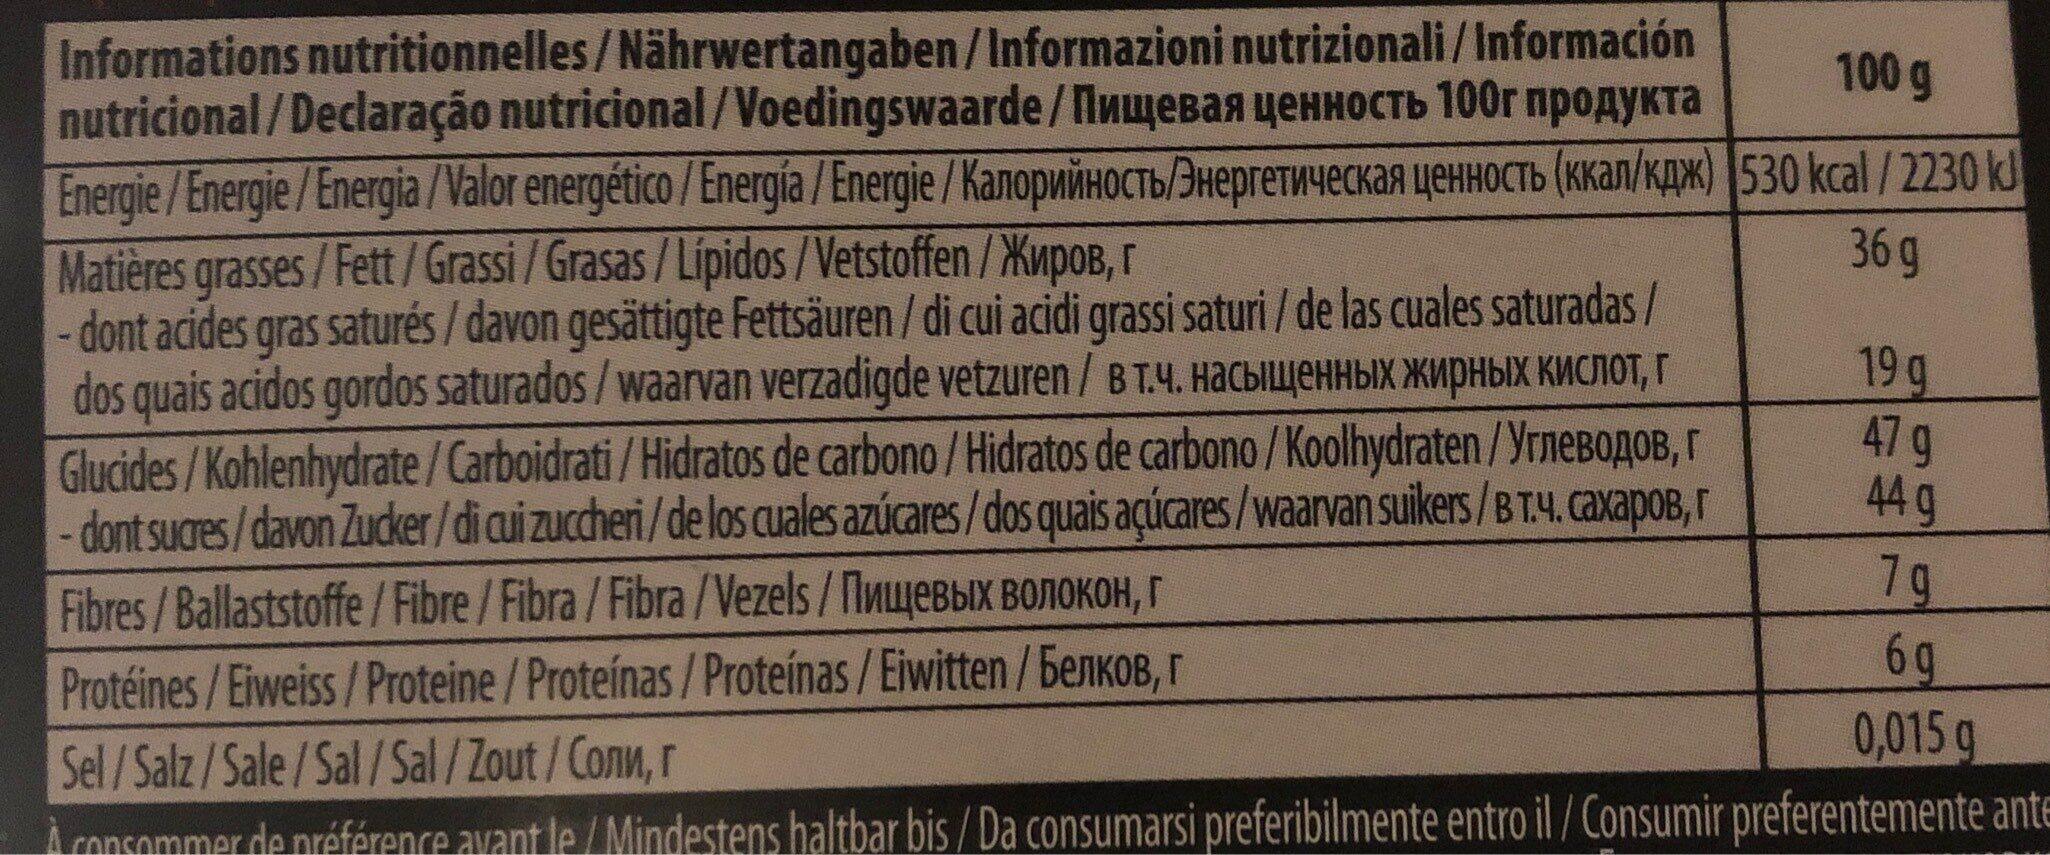 PUR CHOCOLAT SUISSE NOIR Amandes - Informação nutricional - fr